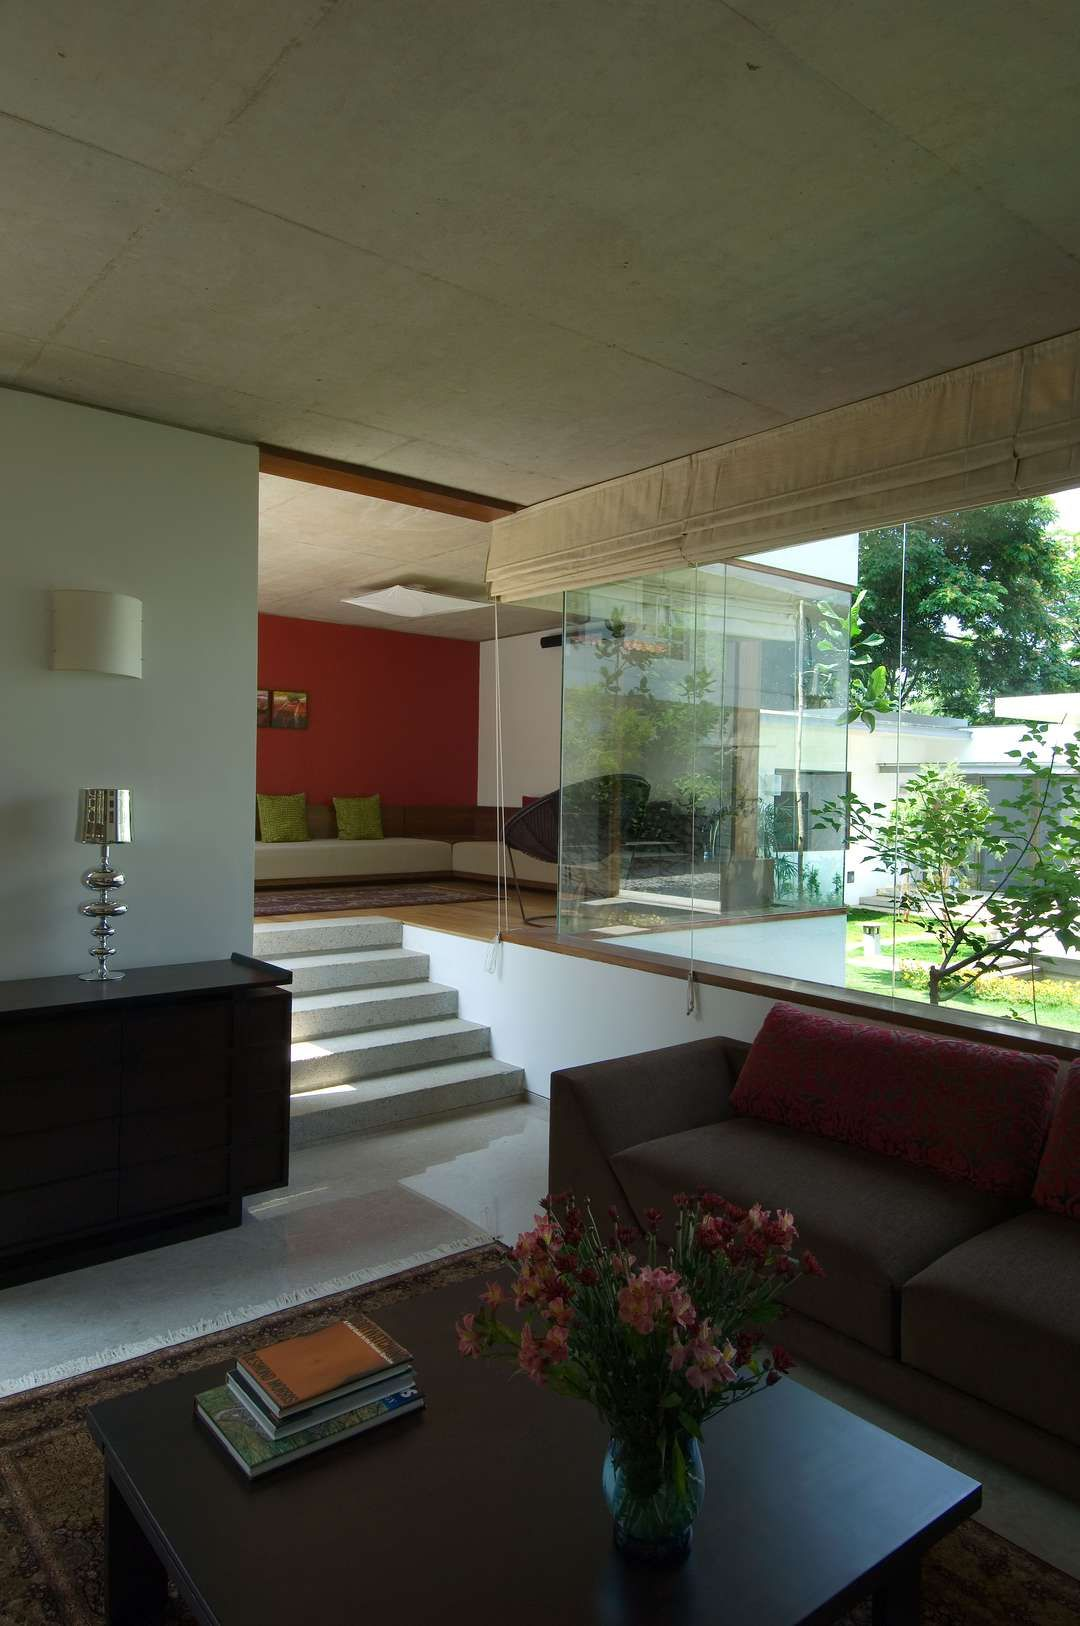 Vastu house on architizer bedroom plans modern design home interior also metro kencana pinterest rh za